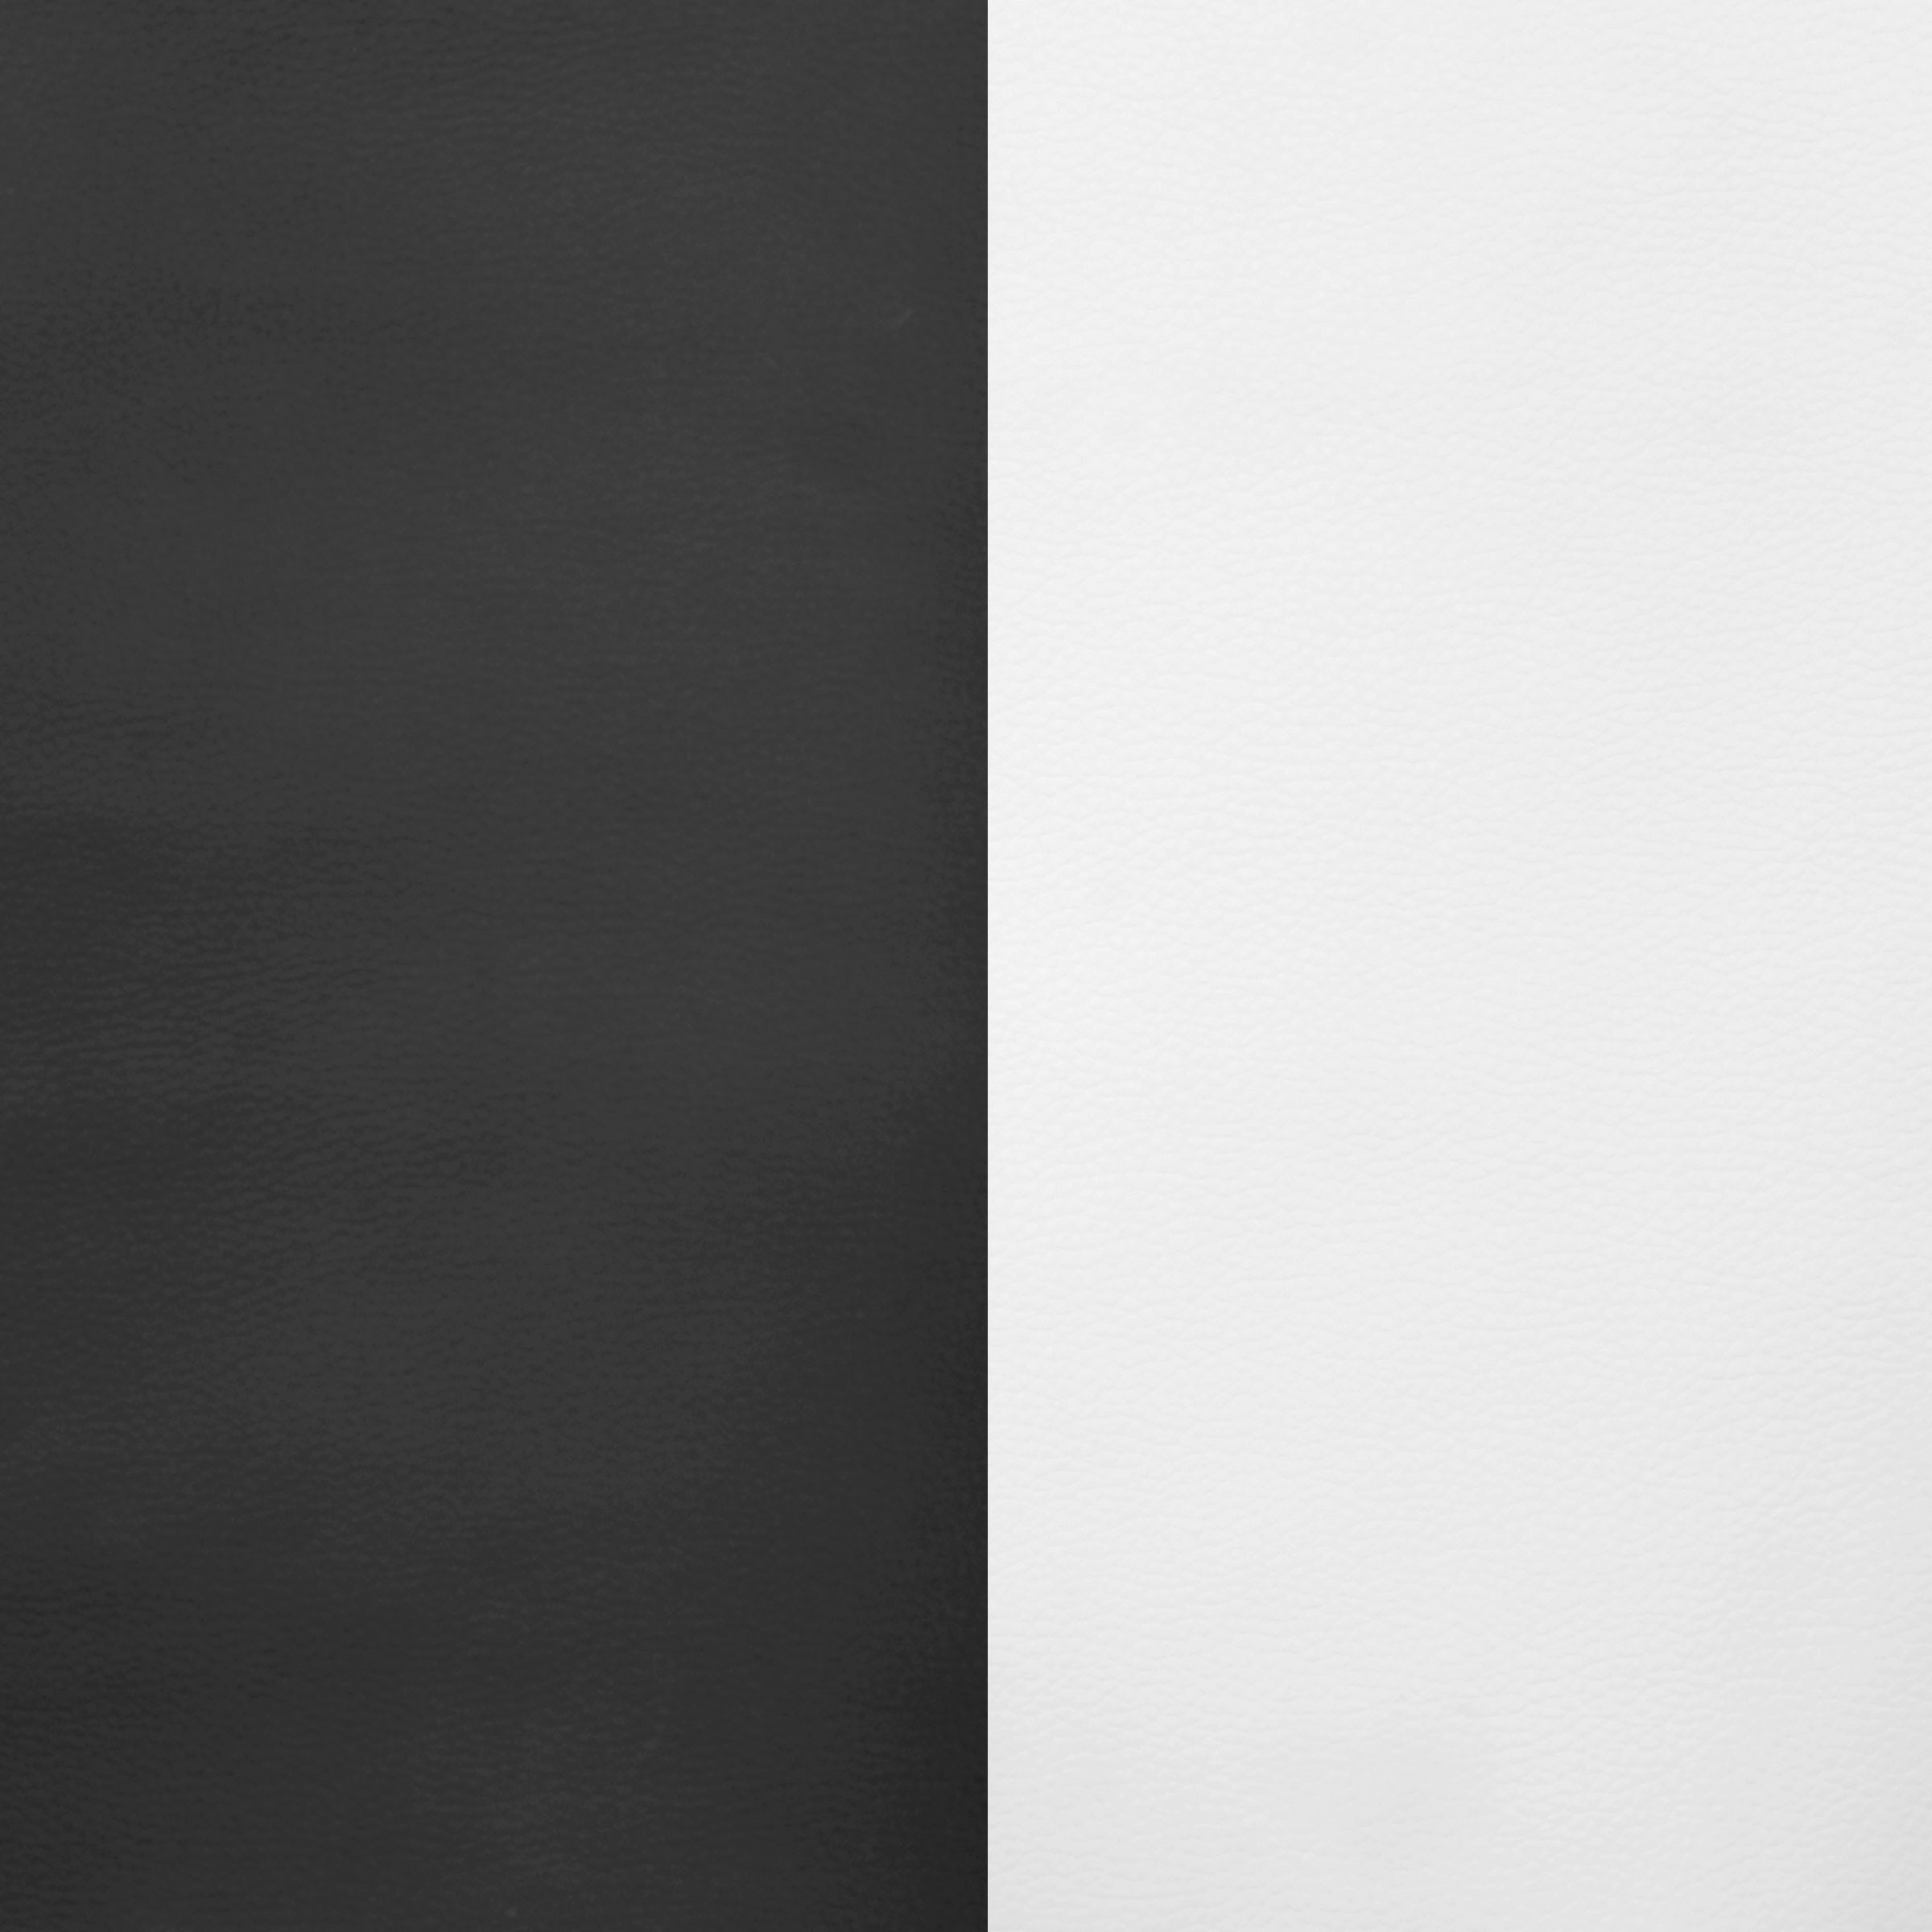 Configuración de Silla Gaming Eclipse de BattleSeat Blanca : Tapizados Simil Piel - Negro - Blanco